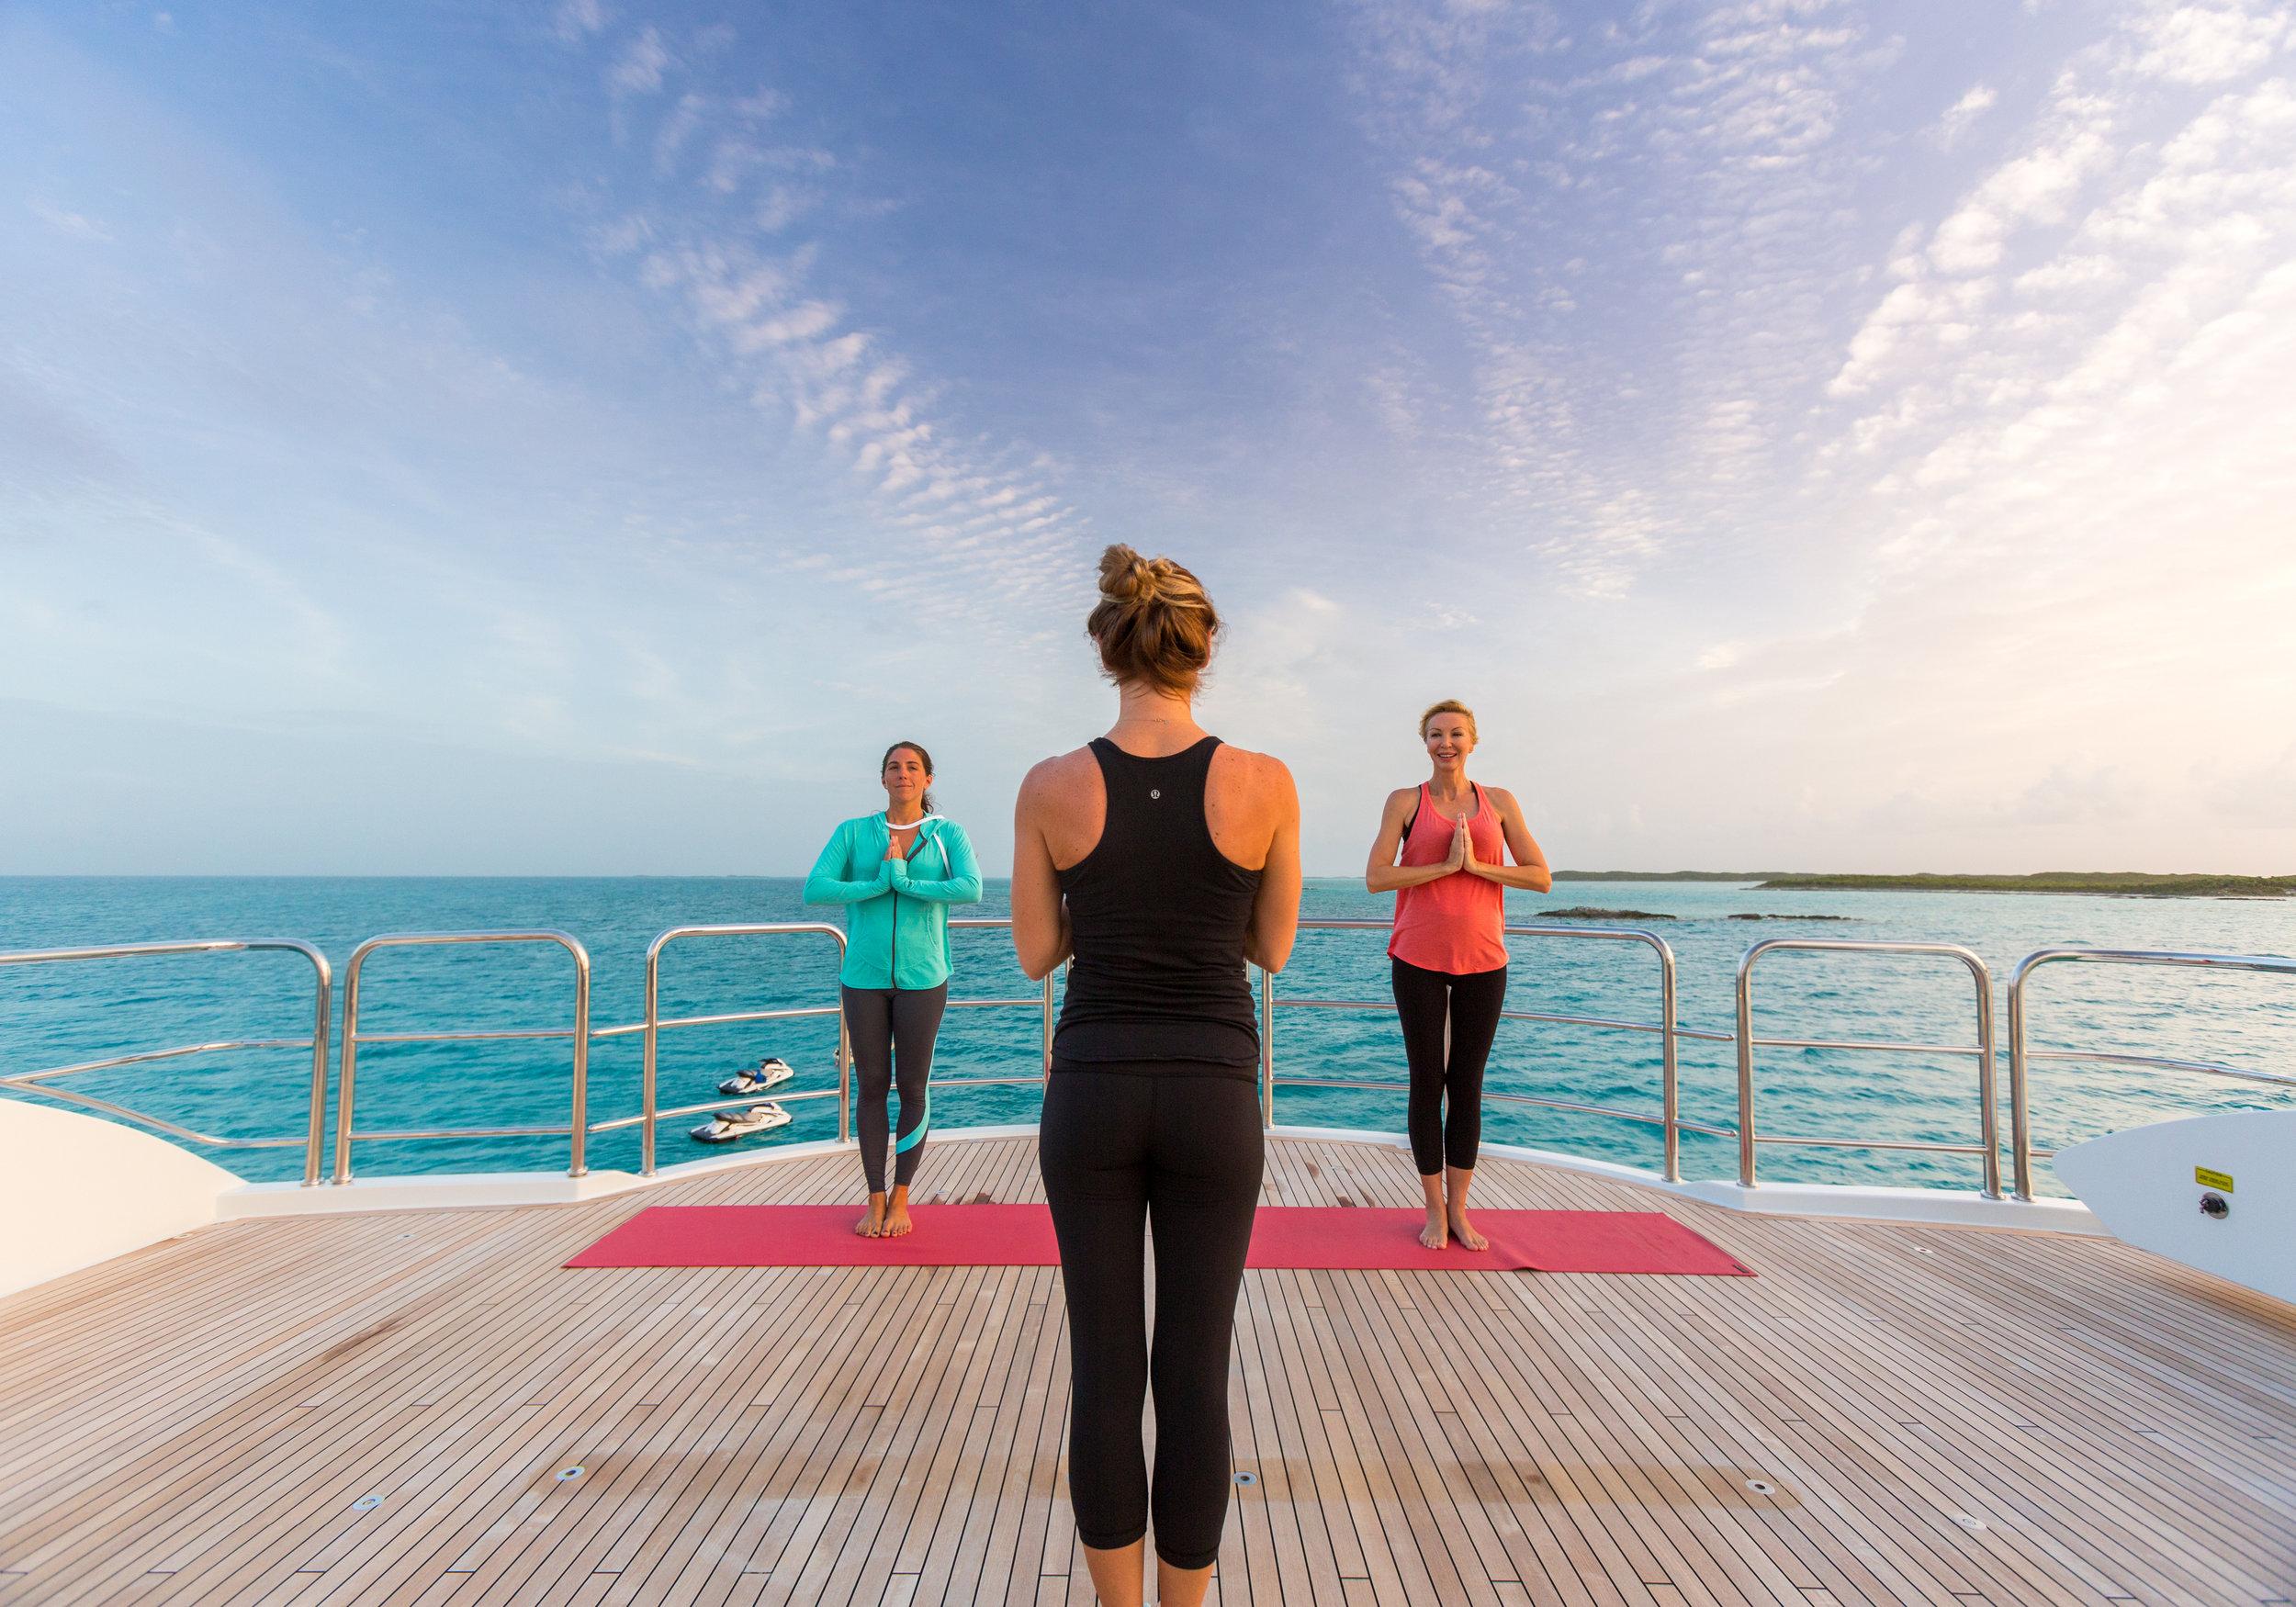 Enjoy a deep breath and a mindful moment amidst the Caribbean beauty